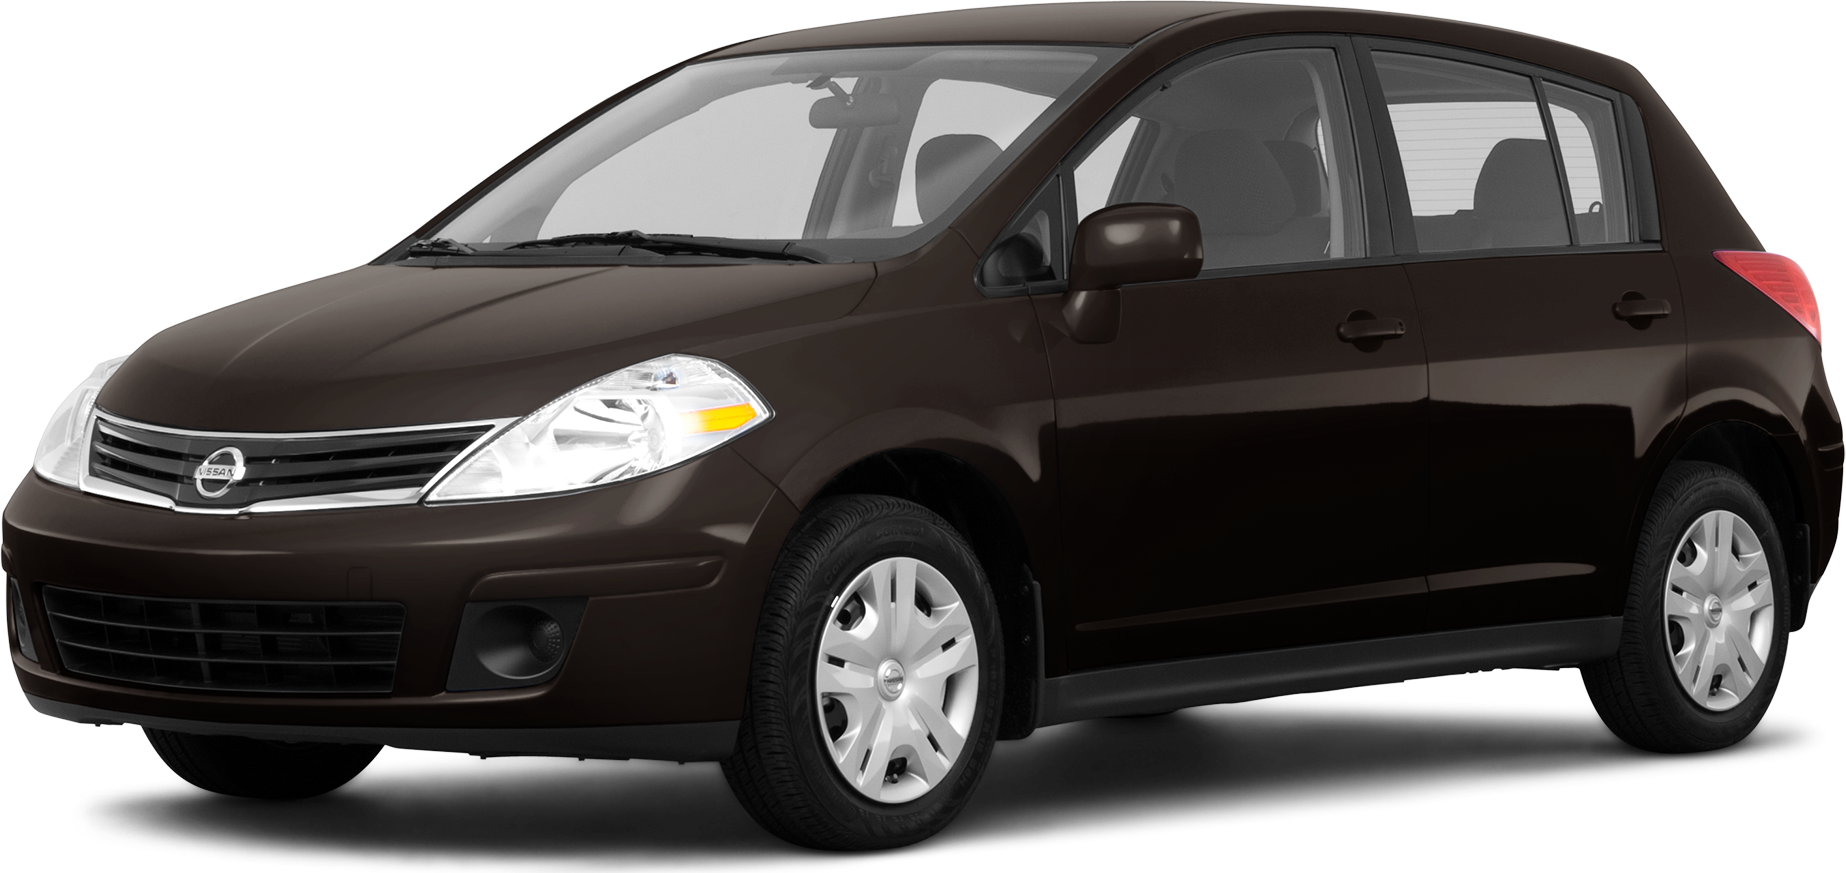 Used 2011 Nissan Versa S Hatchback 4d Prices Kelley Blue Book